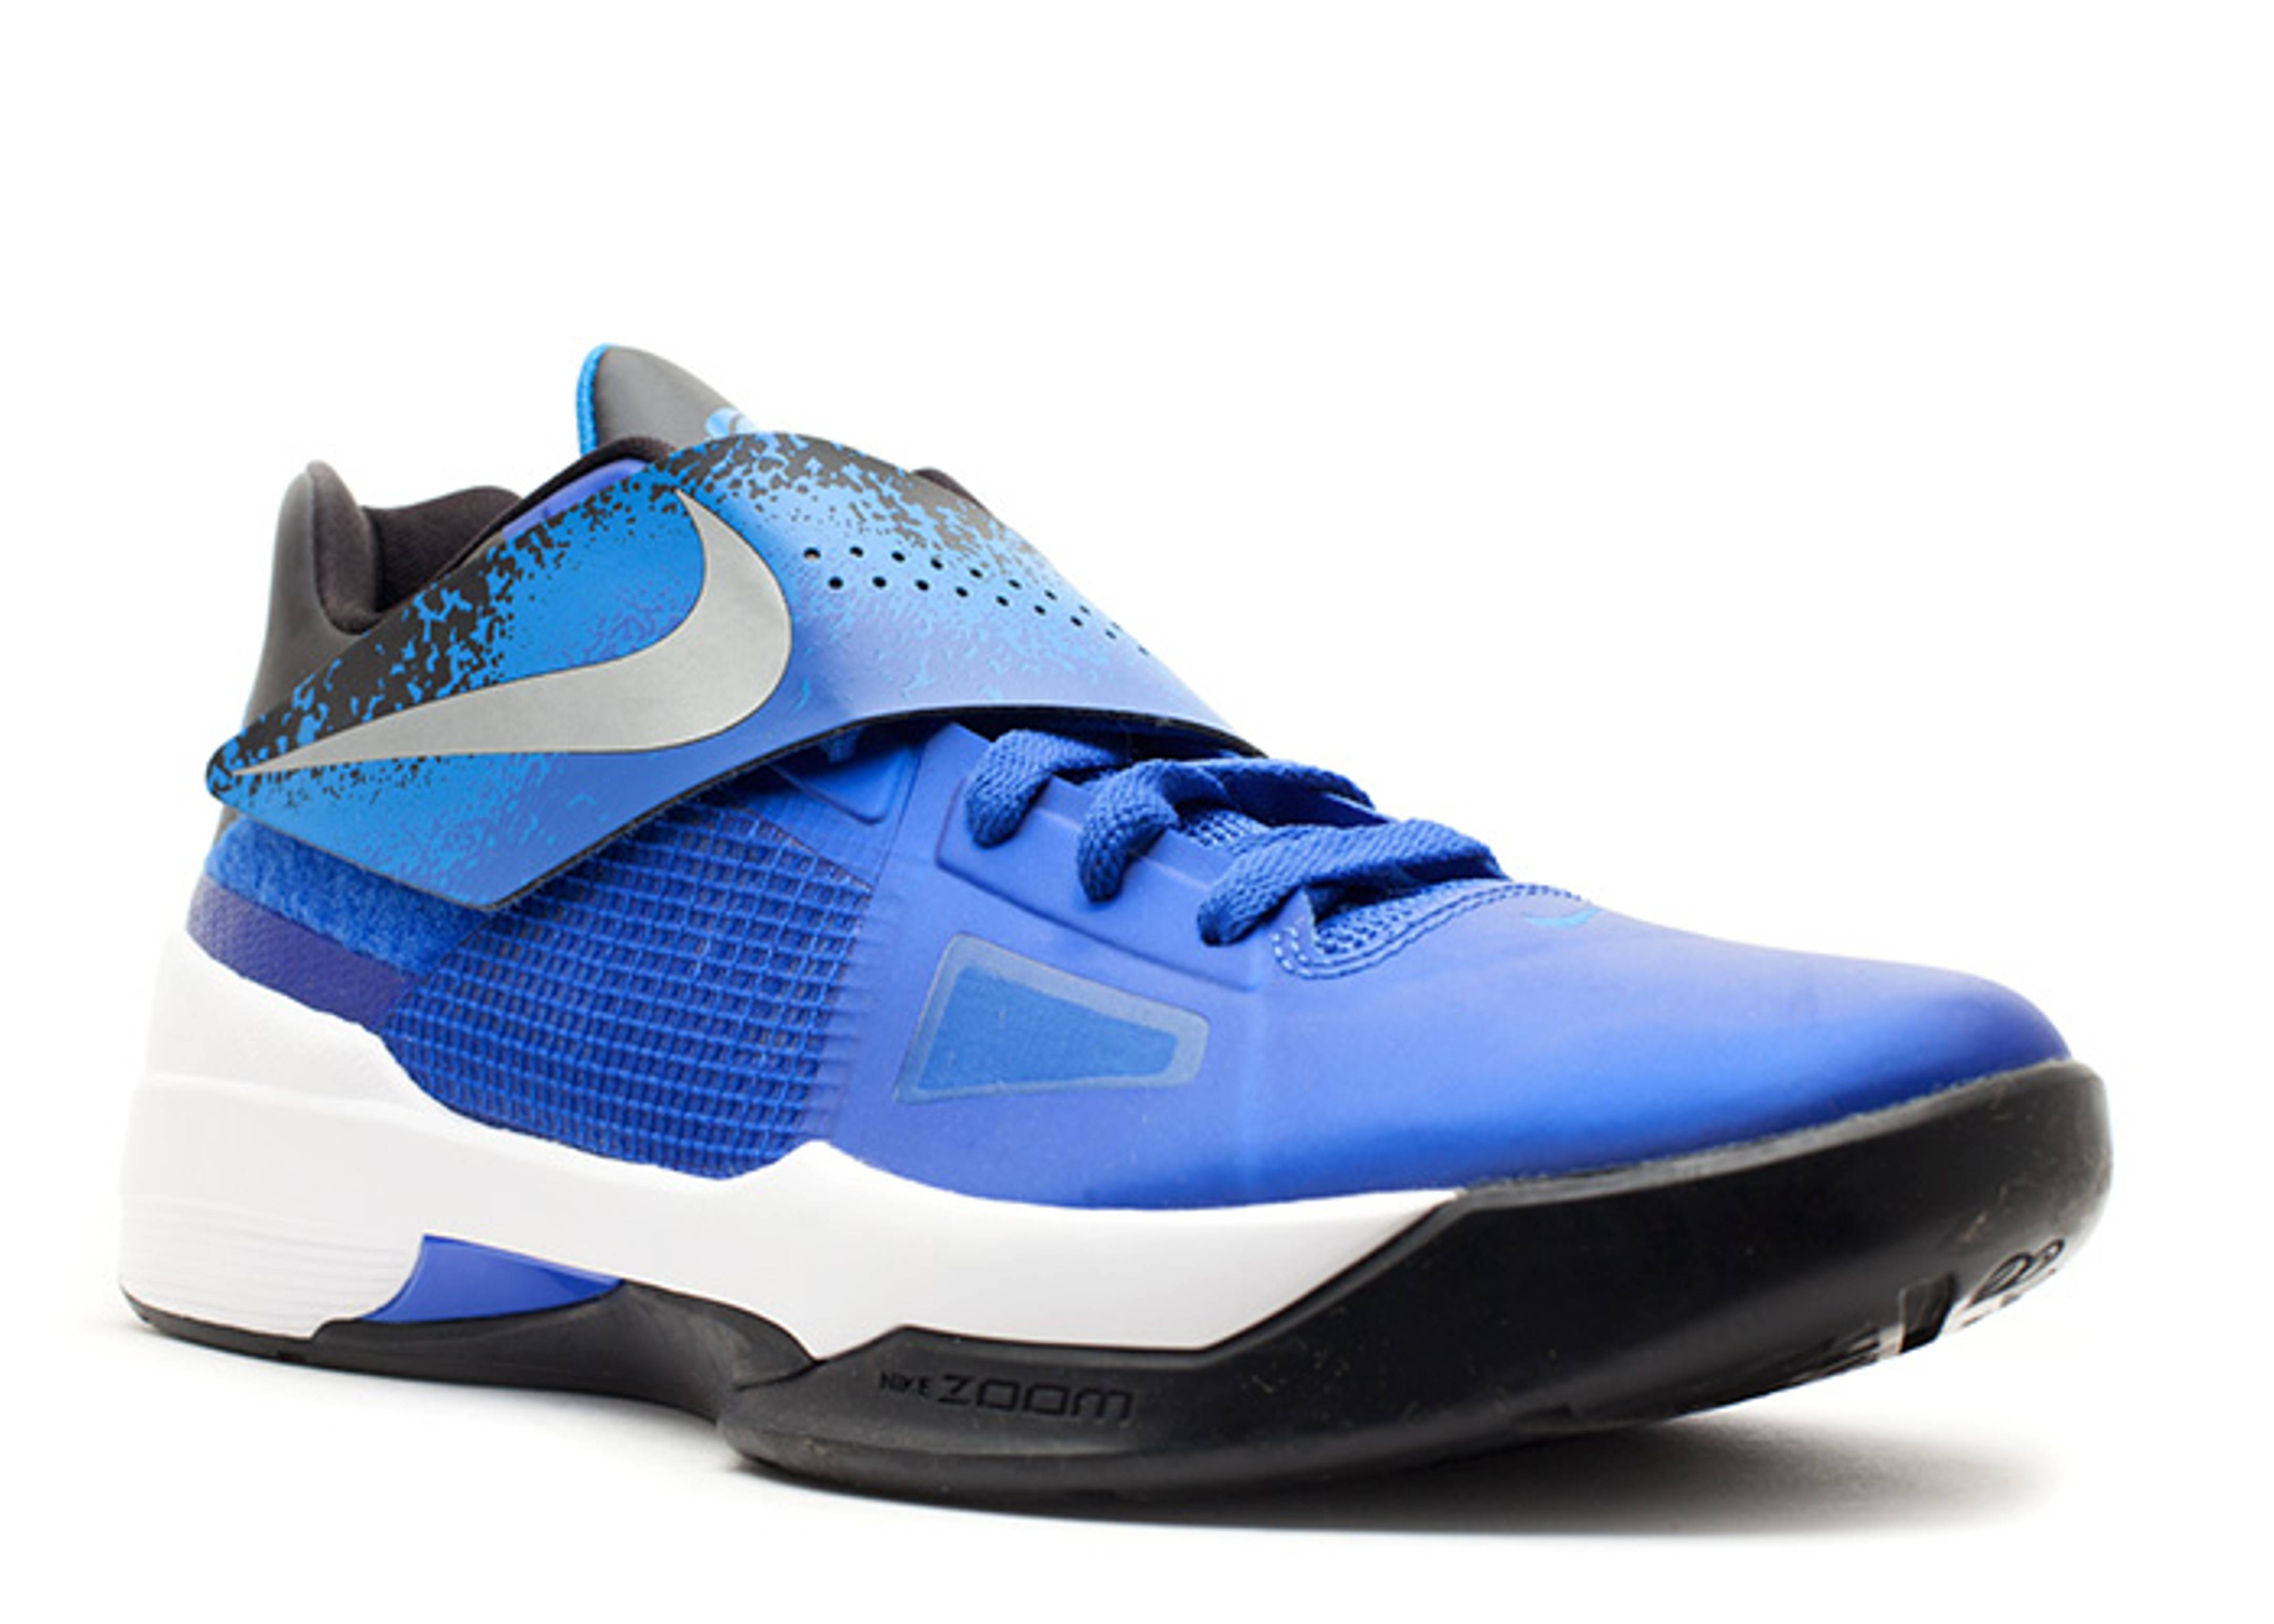 Air Max Presto Salmon Nike Air Sonic Womens Shoes For Boys Girls ... 849fca687